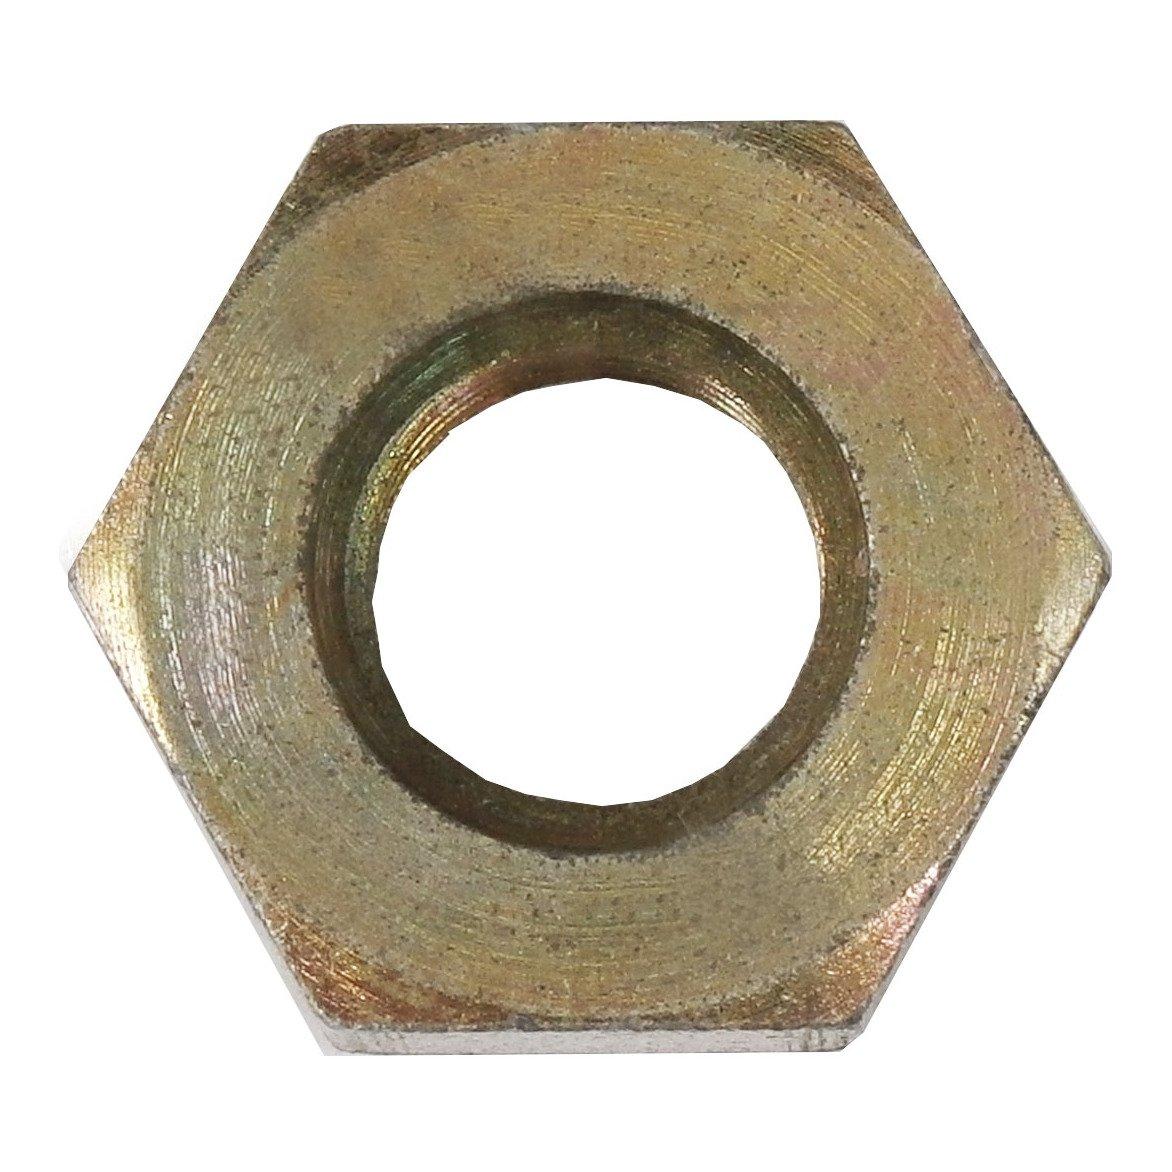 0.220 Width 3//8-24 Thread 0.625 Hex Brennan Industries 0306-03 Steel Bulkhead Lock Nut 3//16 Tube OD